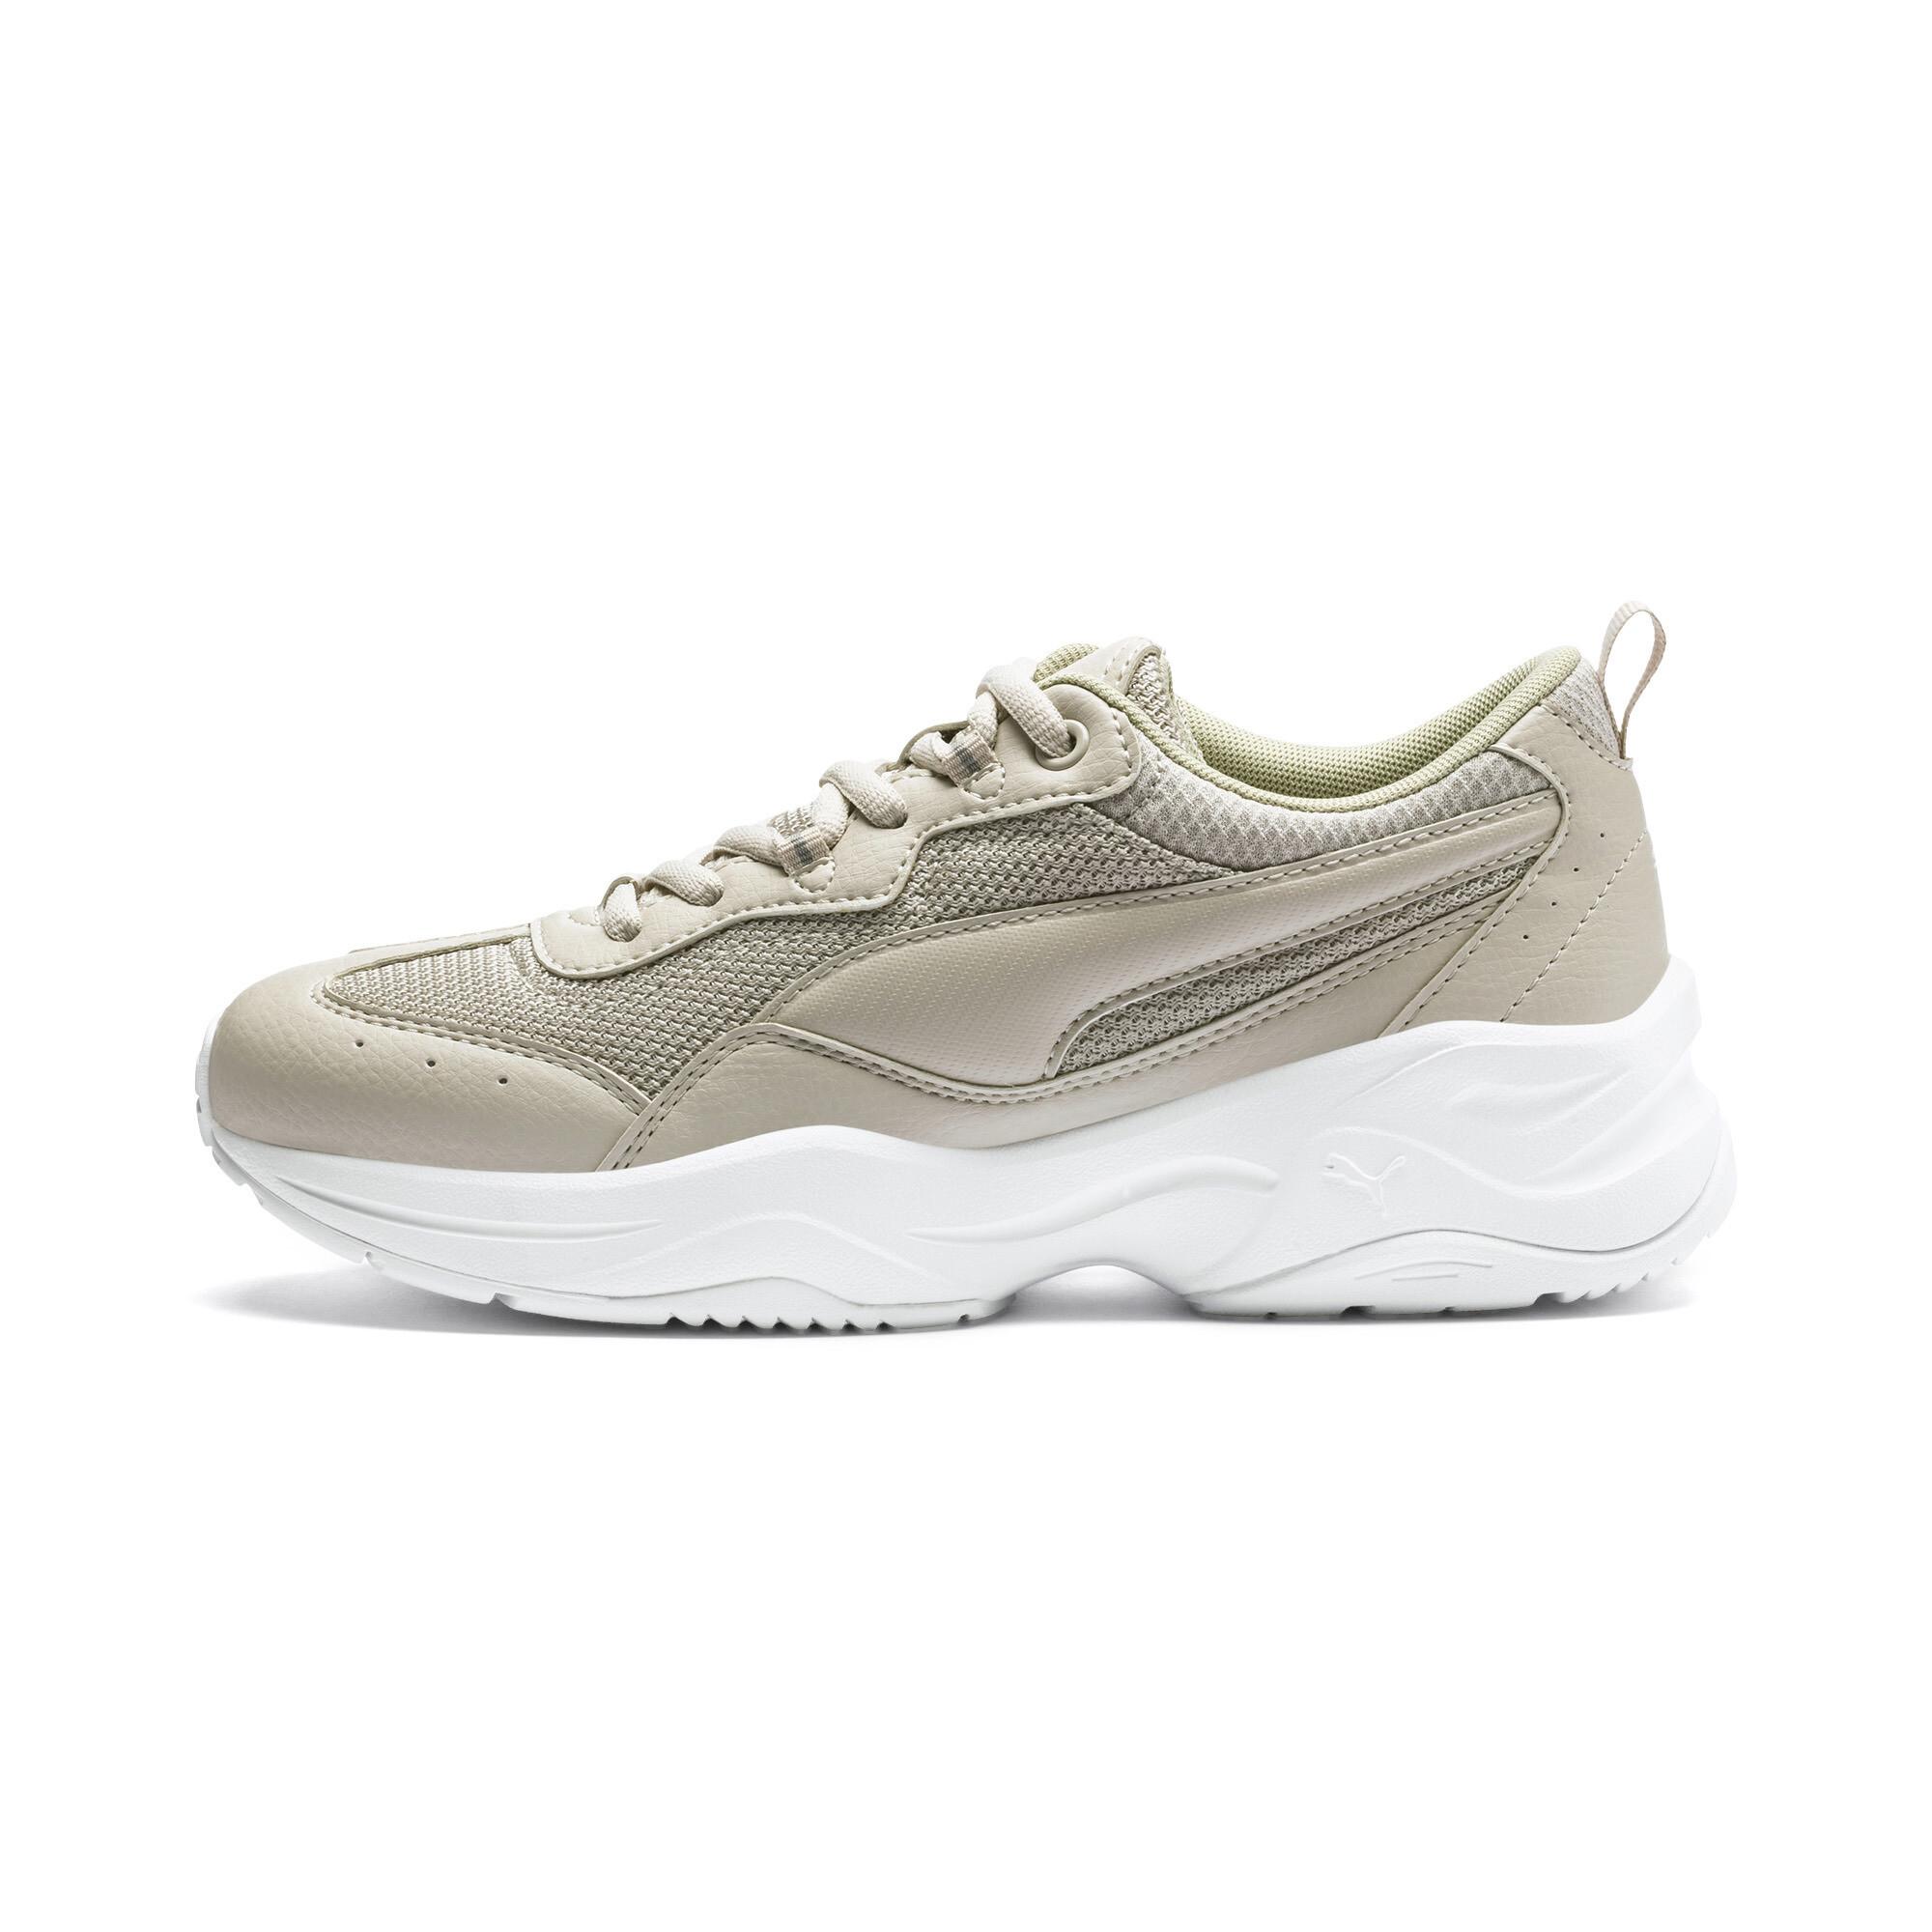 Details zu PUMA Cilia Damen Sneaker Frauen Schuhe Basics Neu